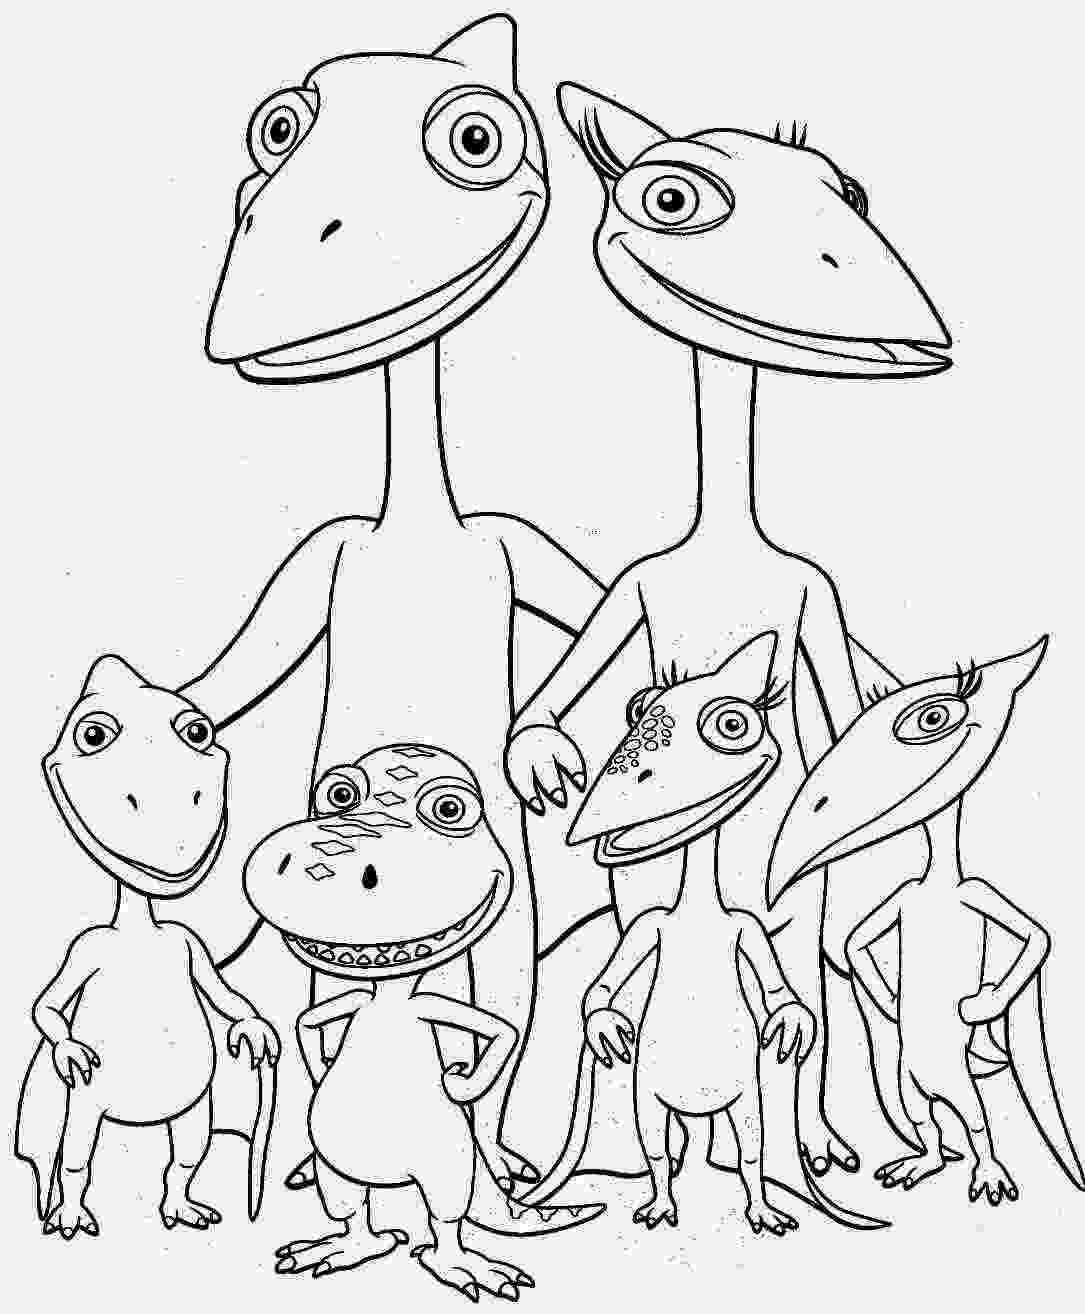 dinosaur sheets free printable dinosaur coloring pages for kids dinosaur sheets 1 2